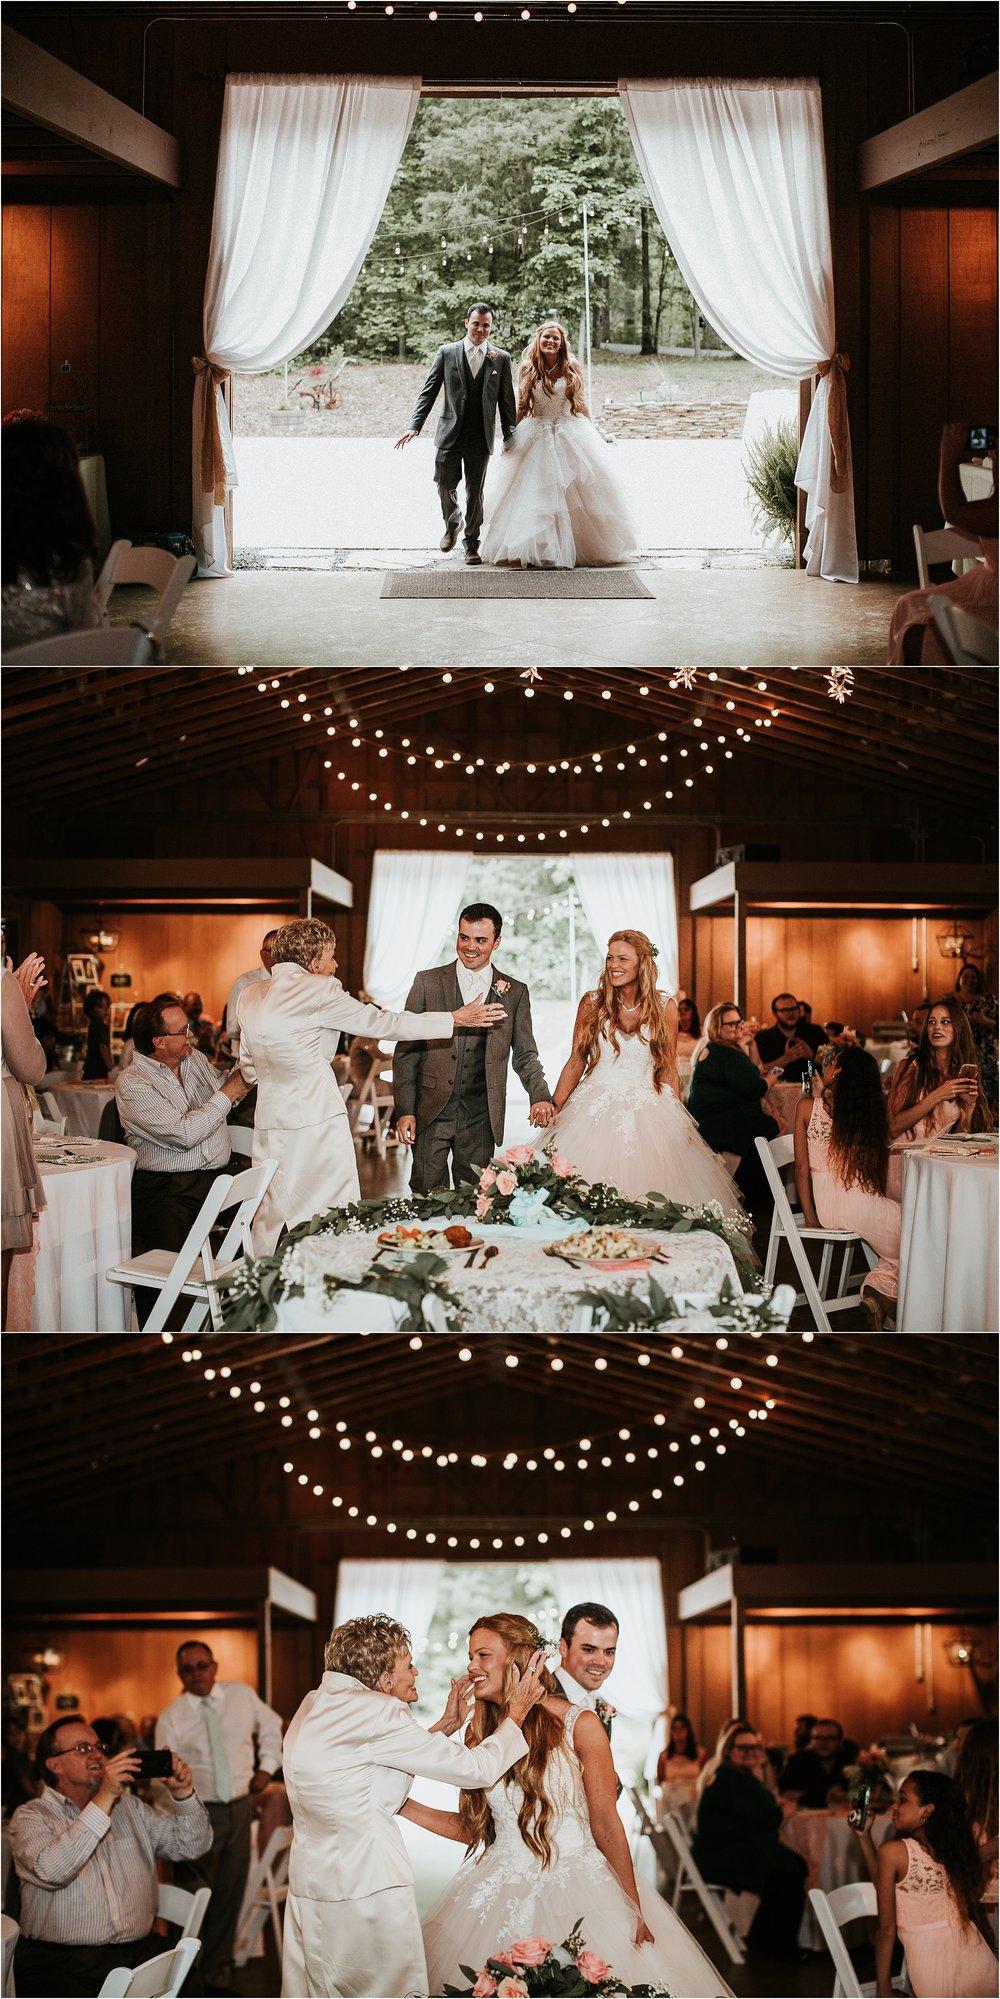 Carolina-Country-Weddings-Mount-Pleasant-nc-158.jpg